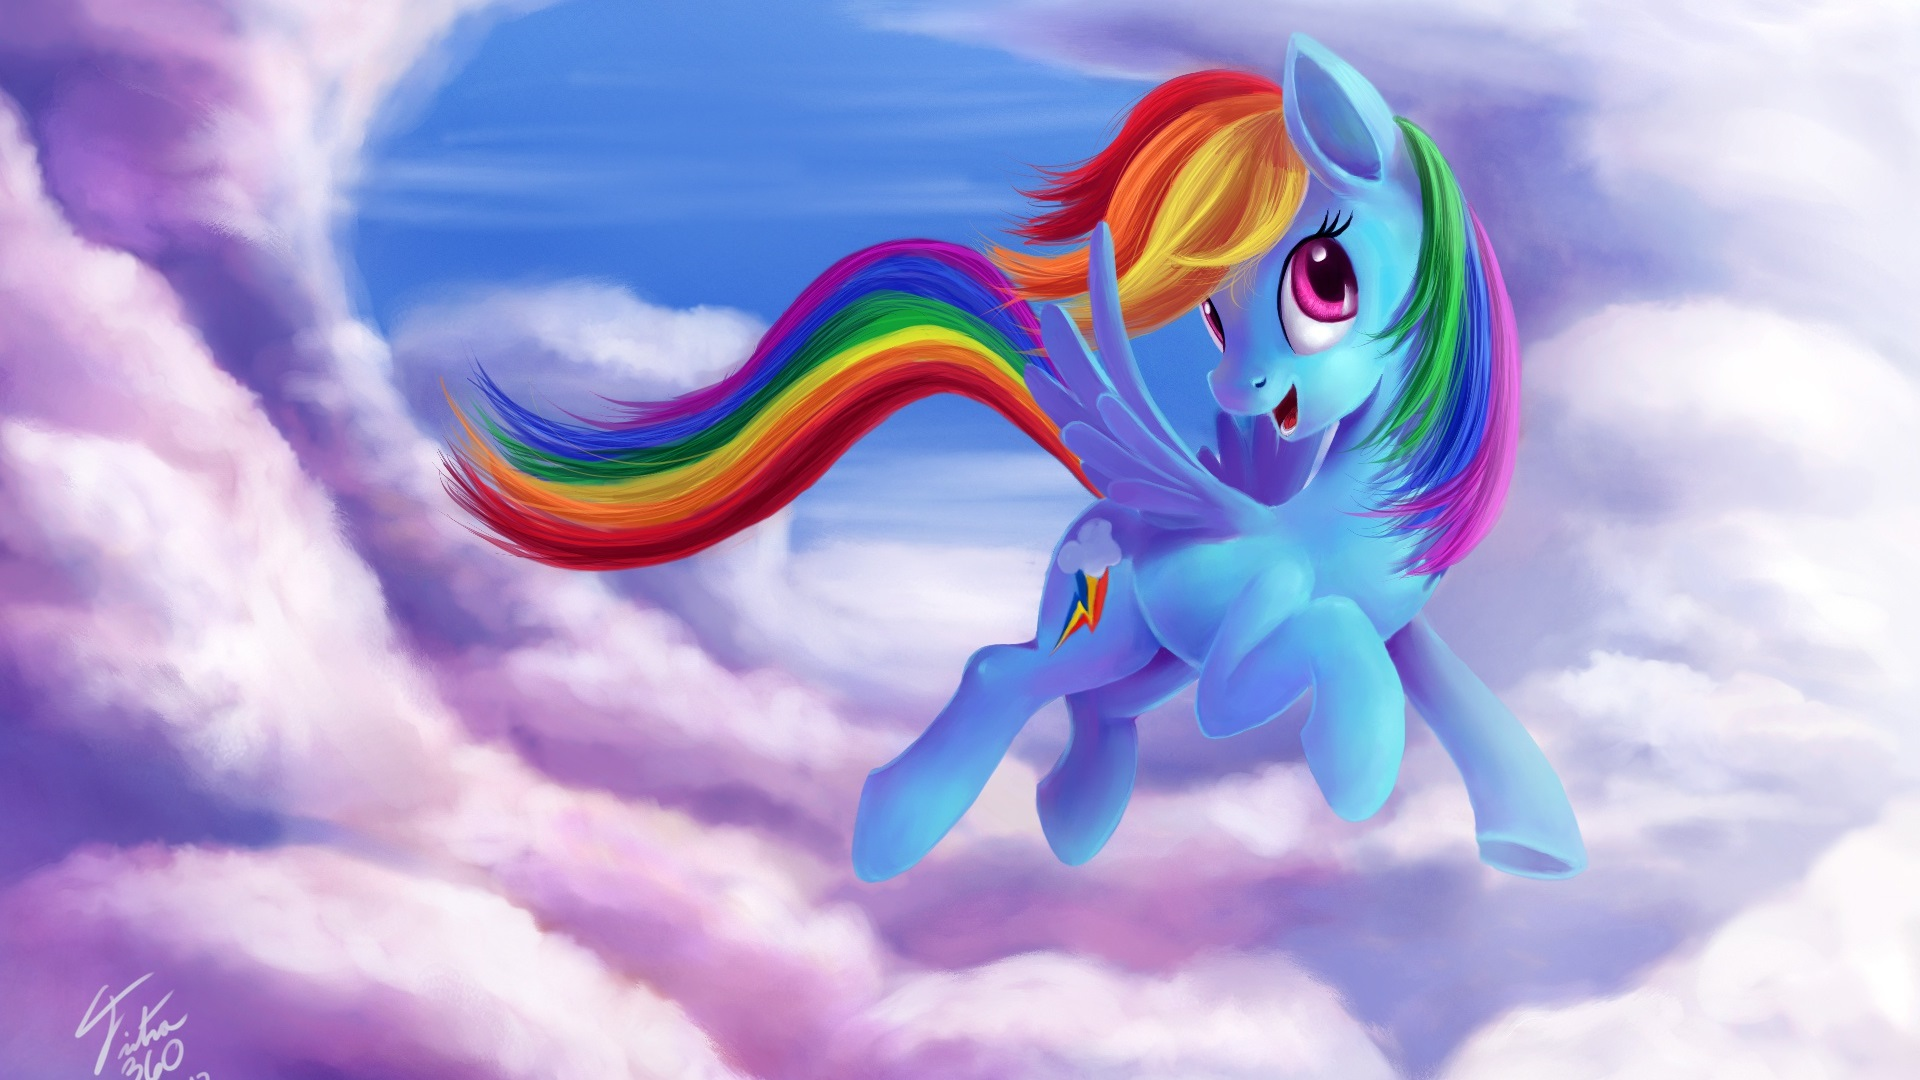 Wallpaper Rainbow Dash My Little Pony Friendship Is Magic